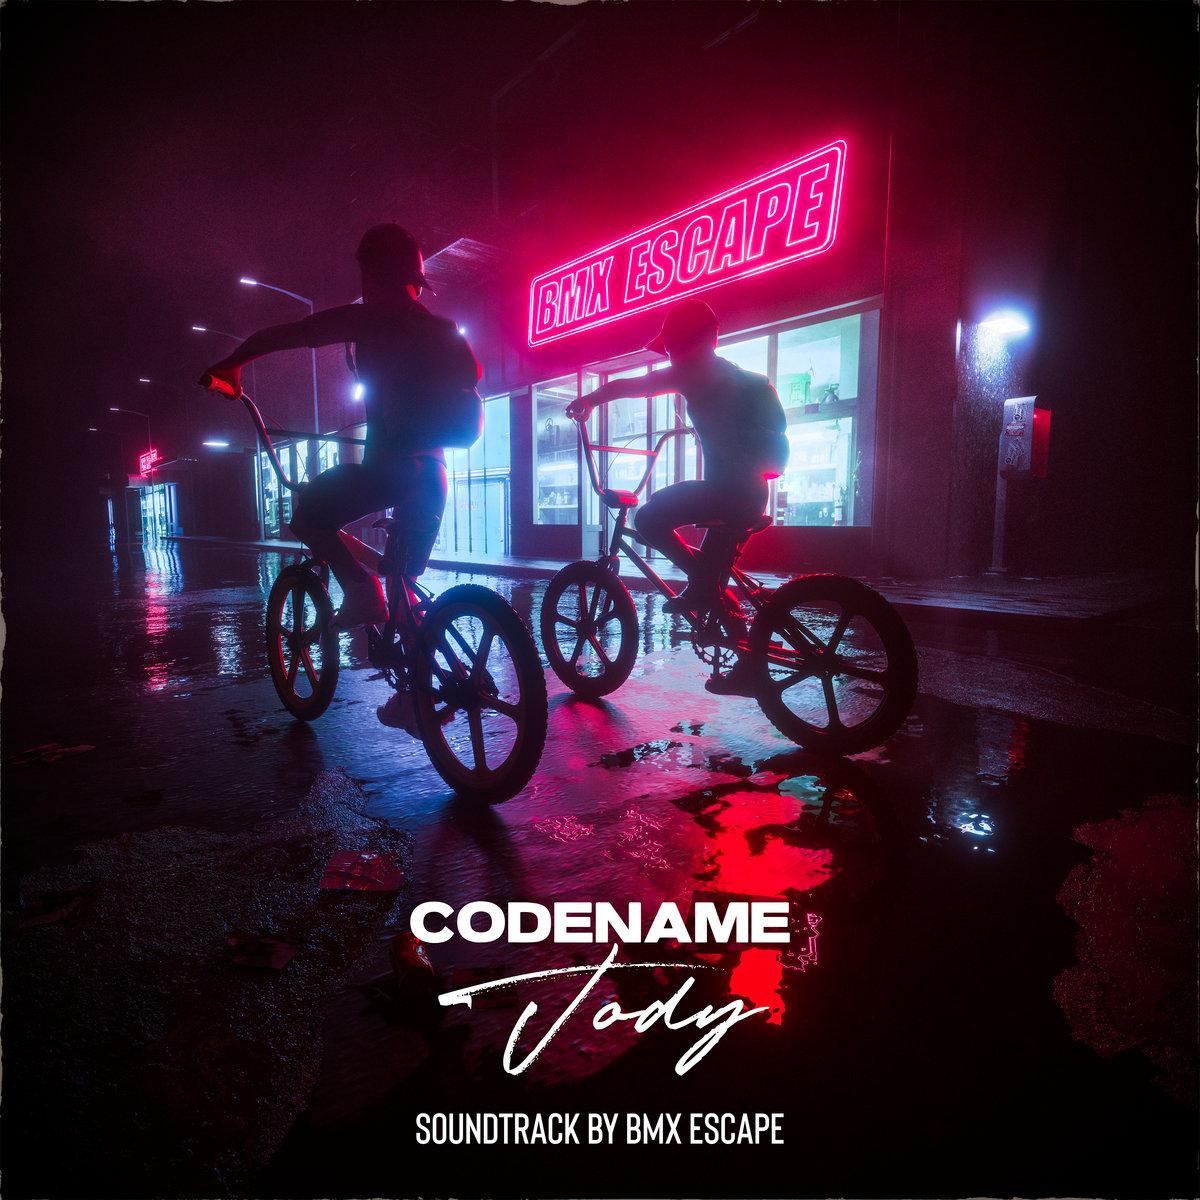 a4085207385 10 - Ride with BMX Escape's 'CODENAME Jody'